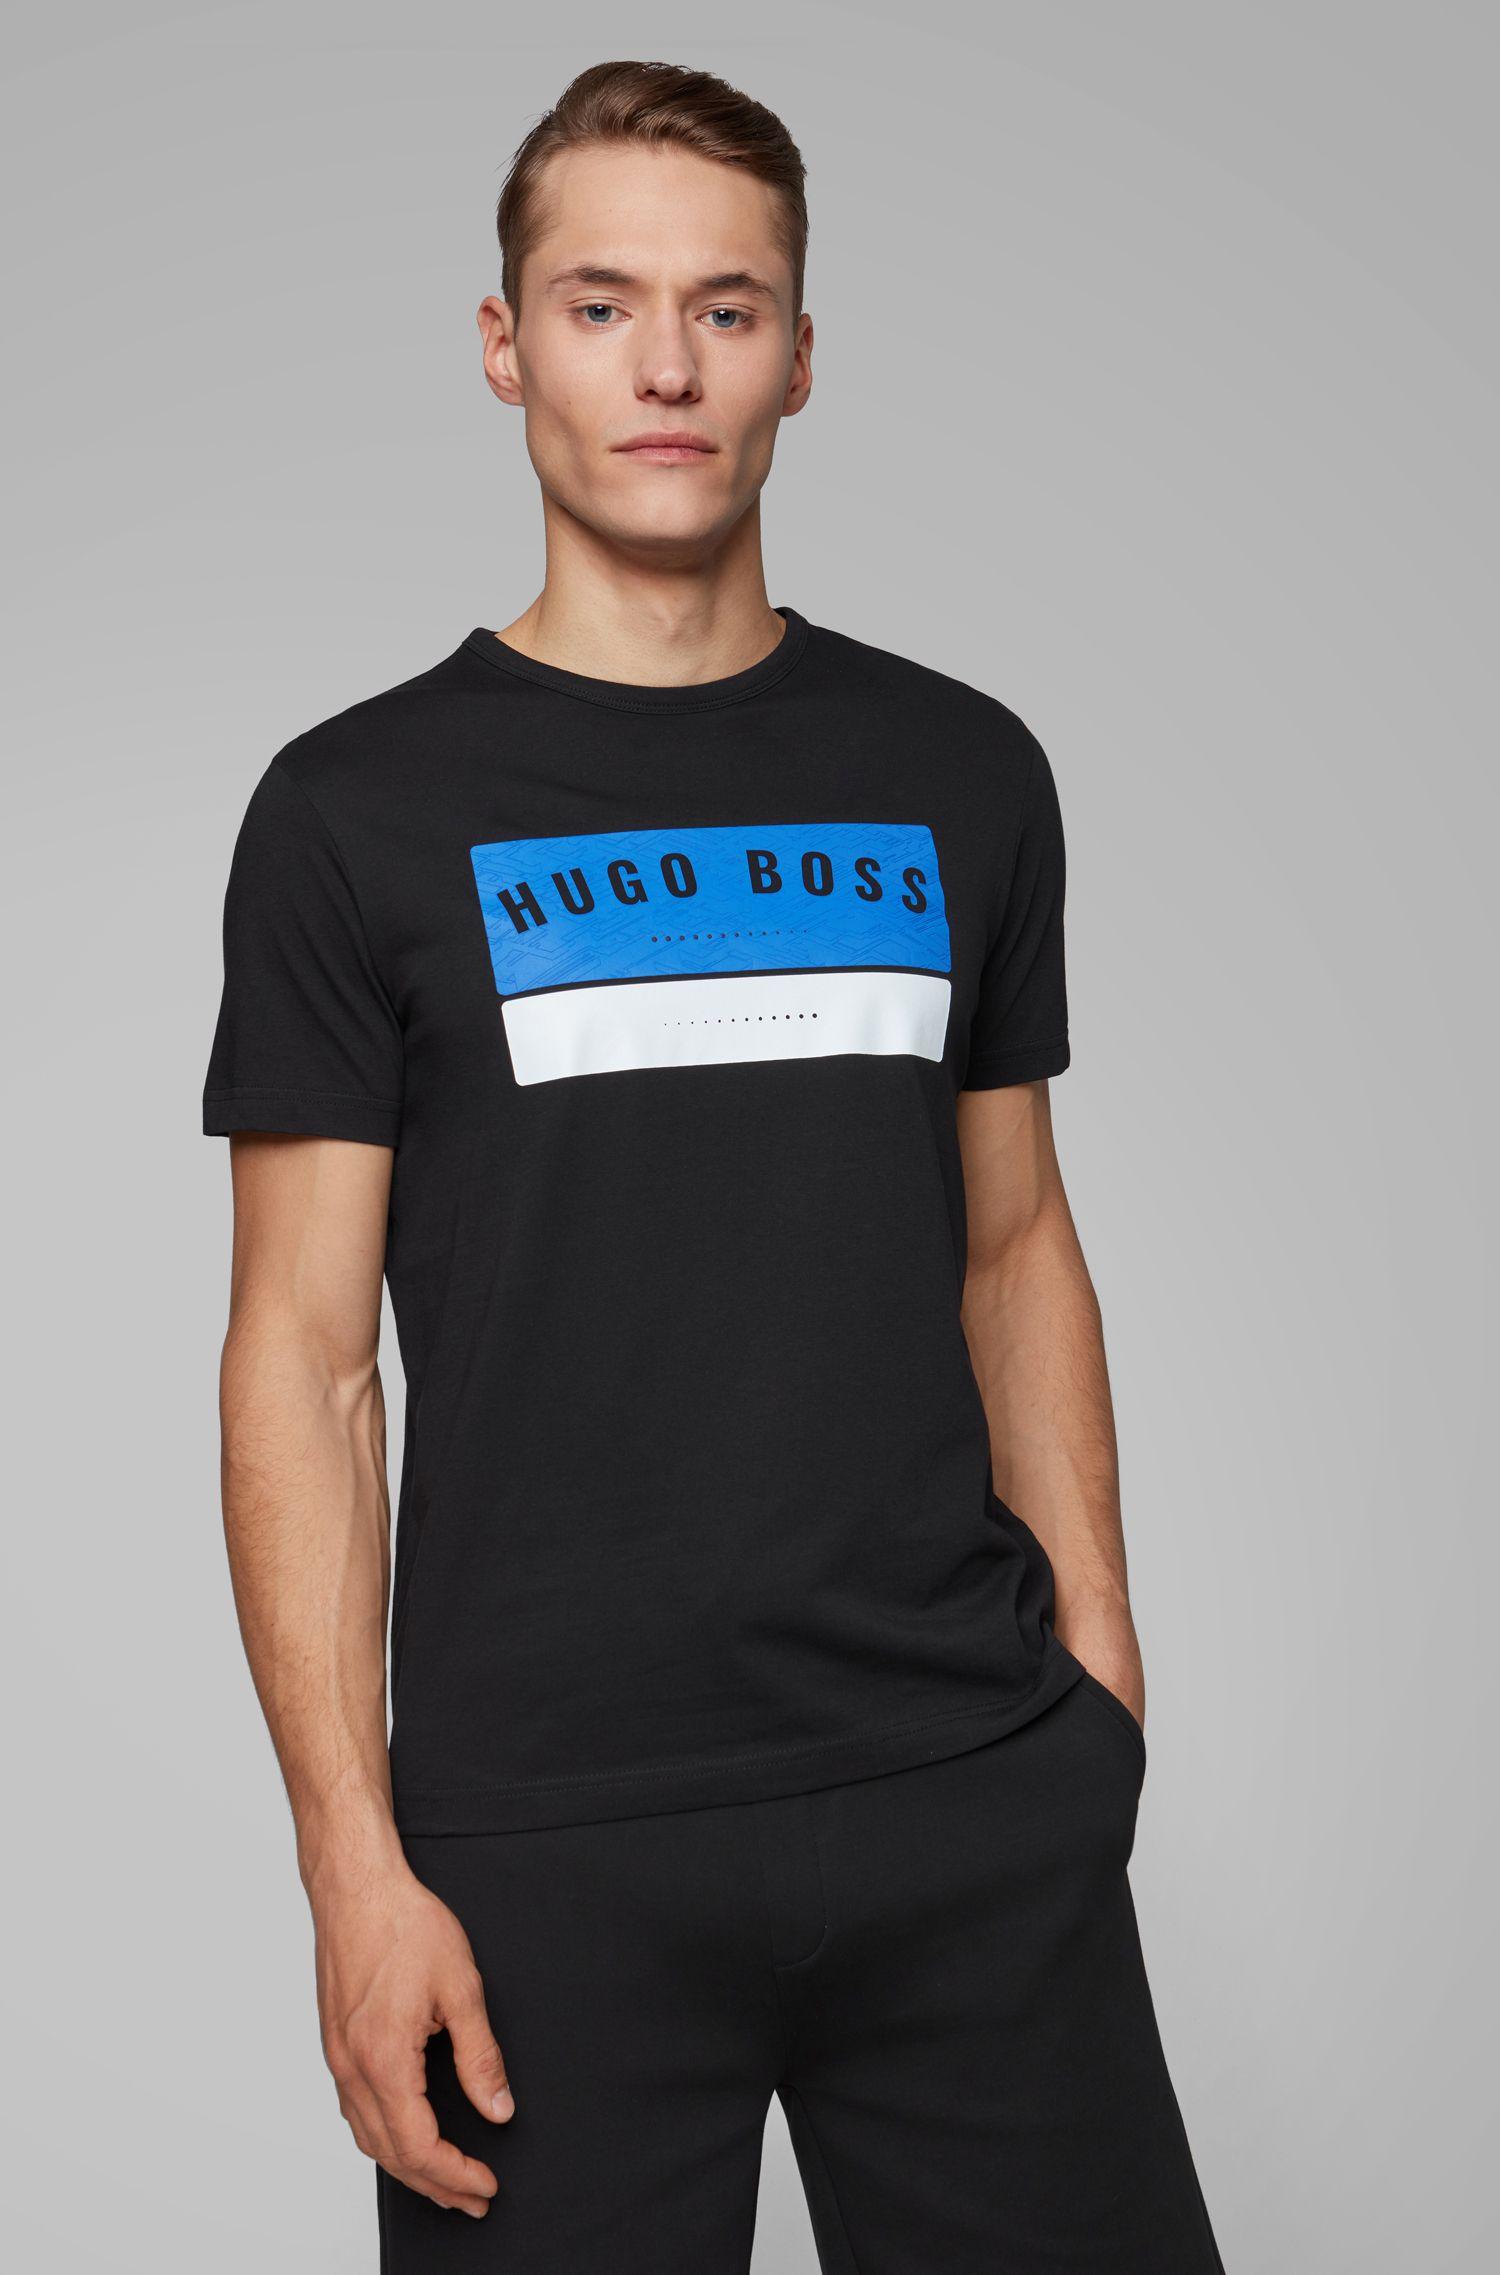 Cotton T-shirt with high-density logo artwork, Black